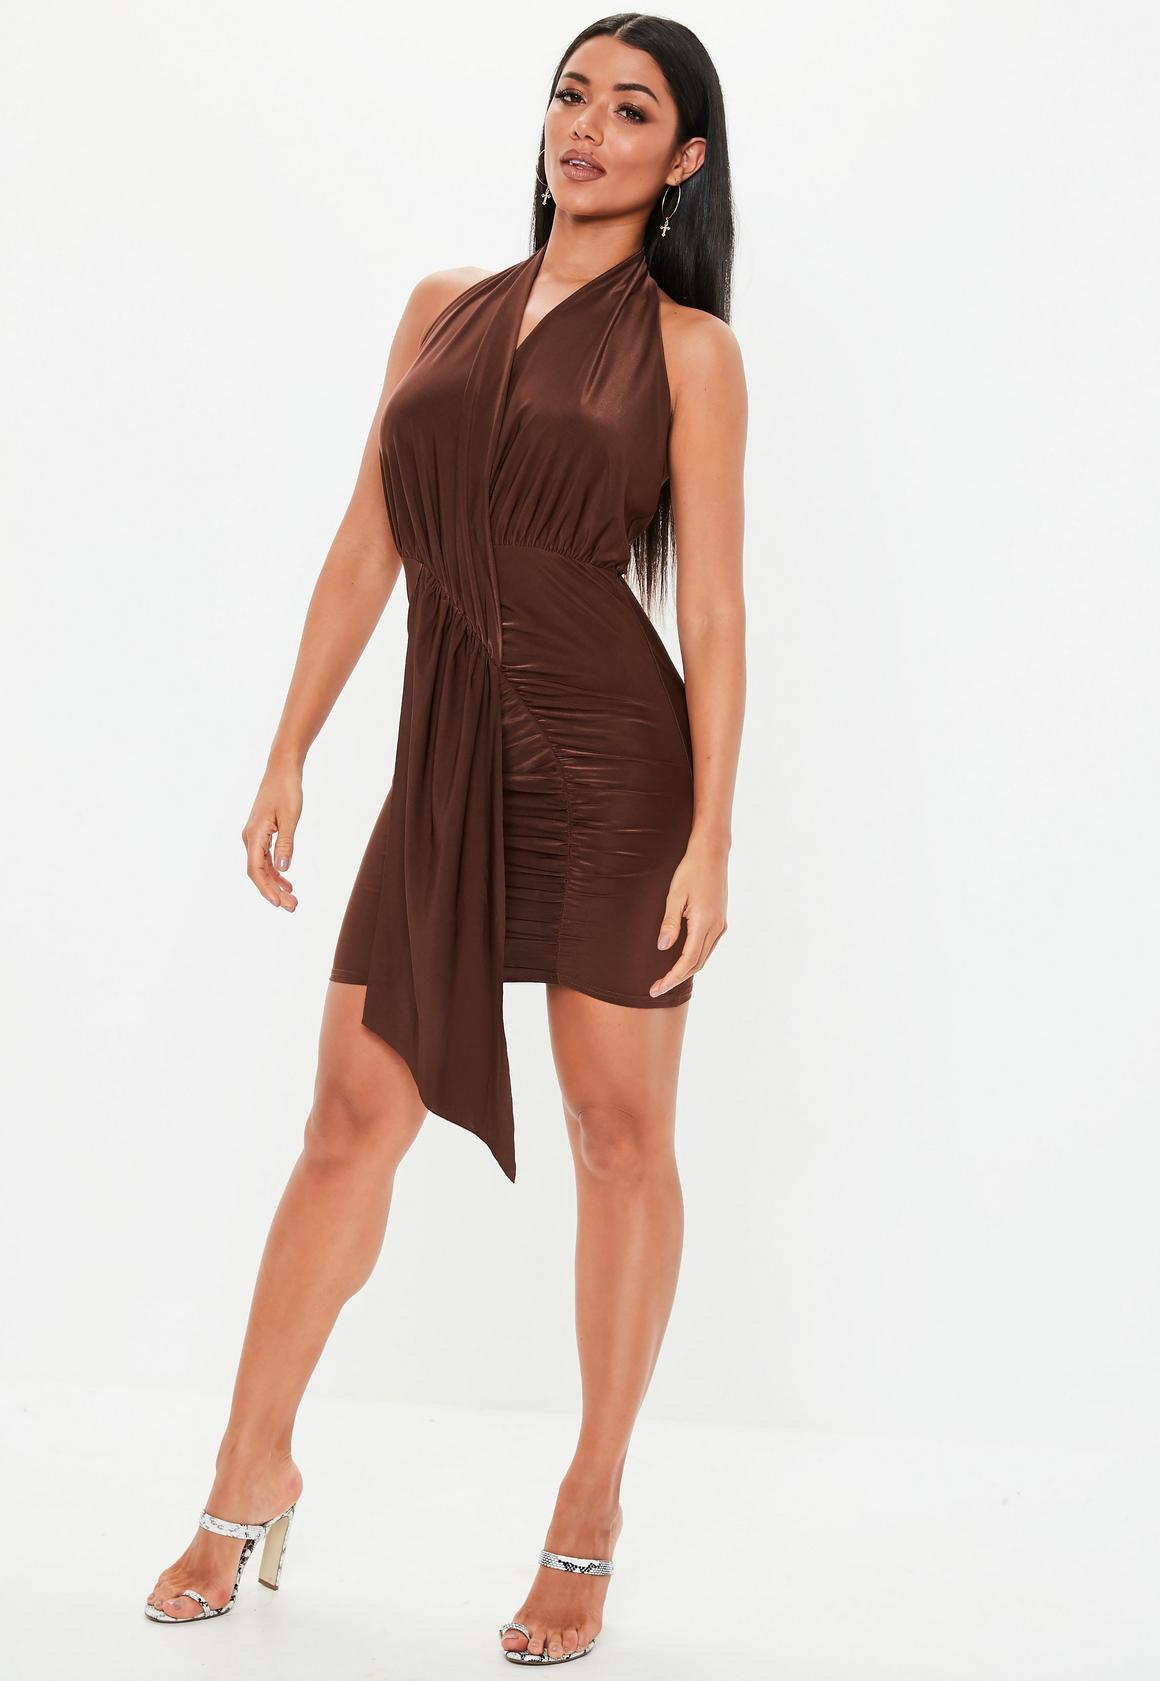 Missguided - robe dos-nu courte tissu drappé  - 2